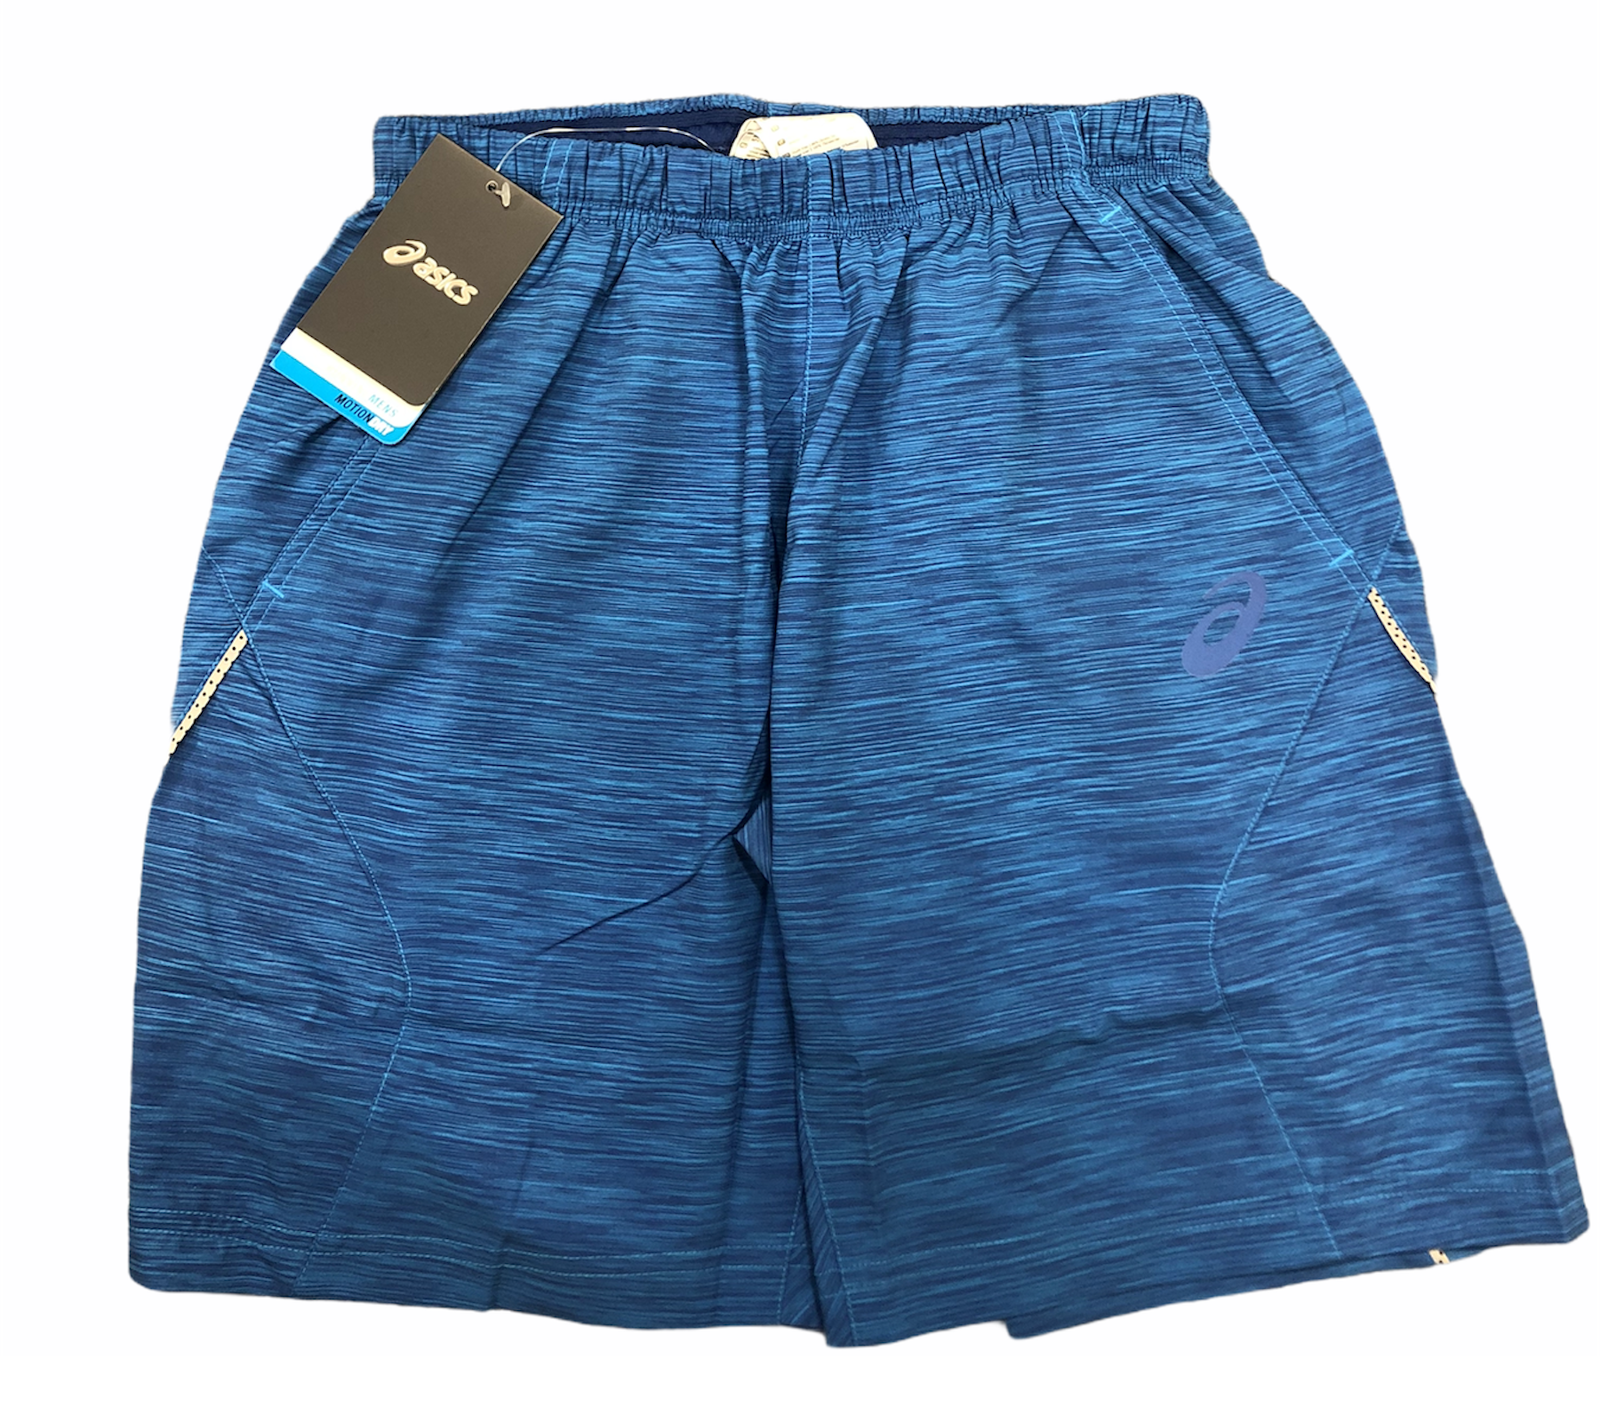 Asics Men's Running Shorts 11 Inch Soukai Training Shorts - Blue - New